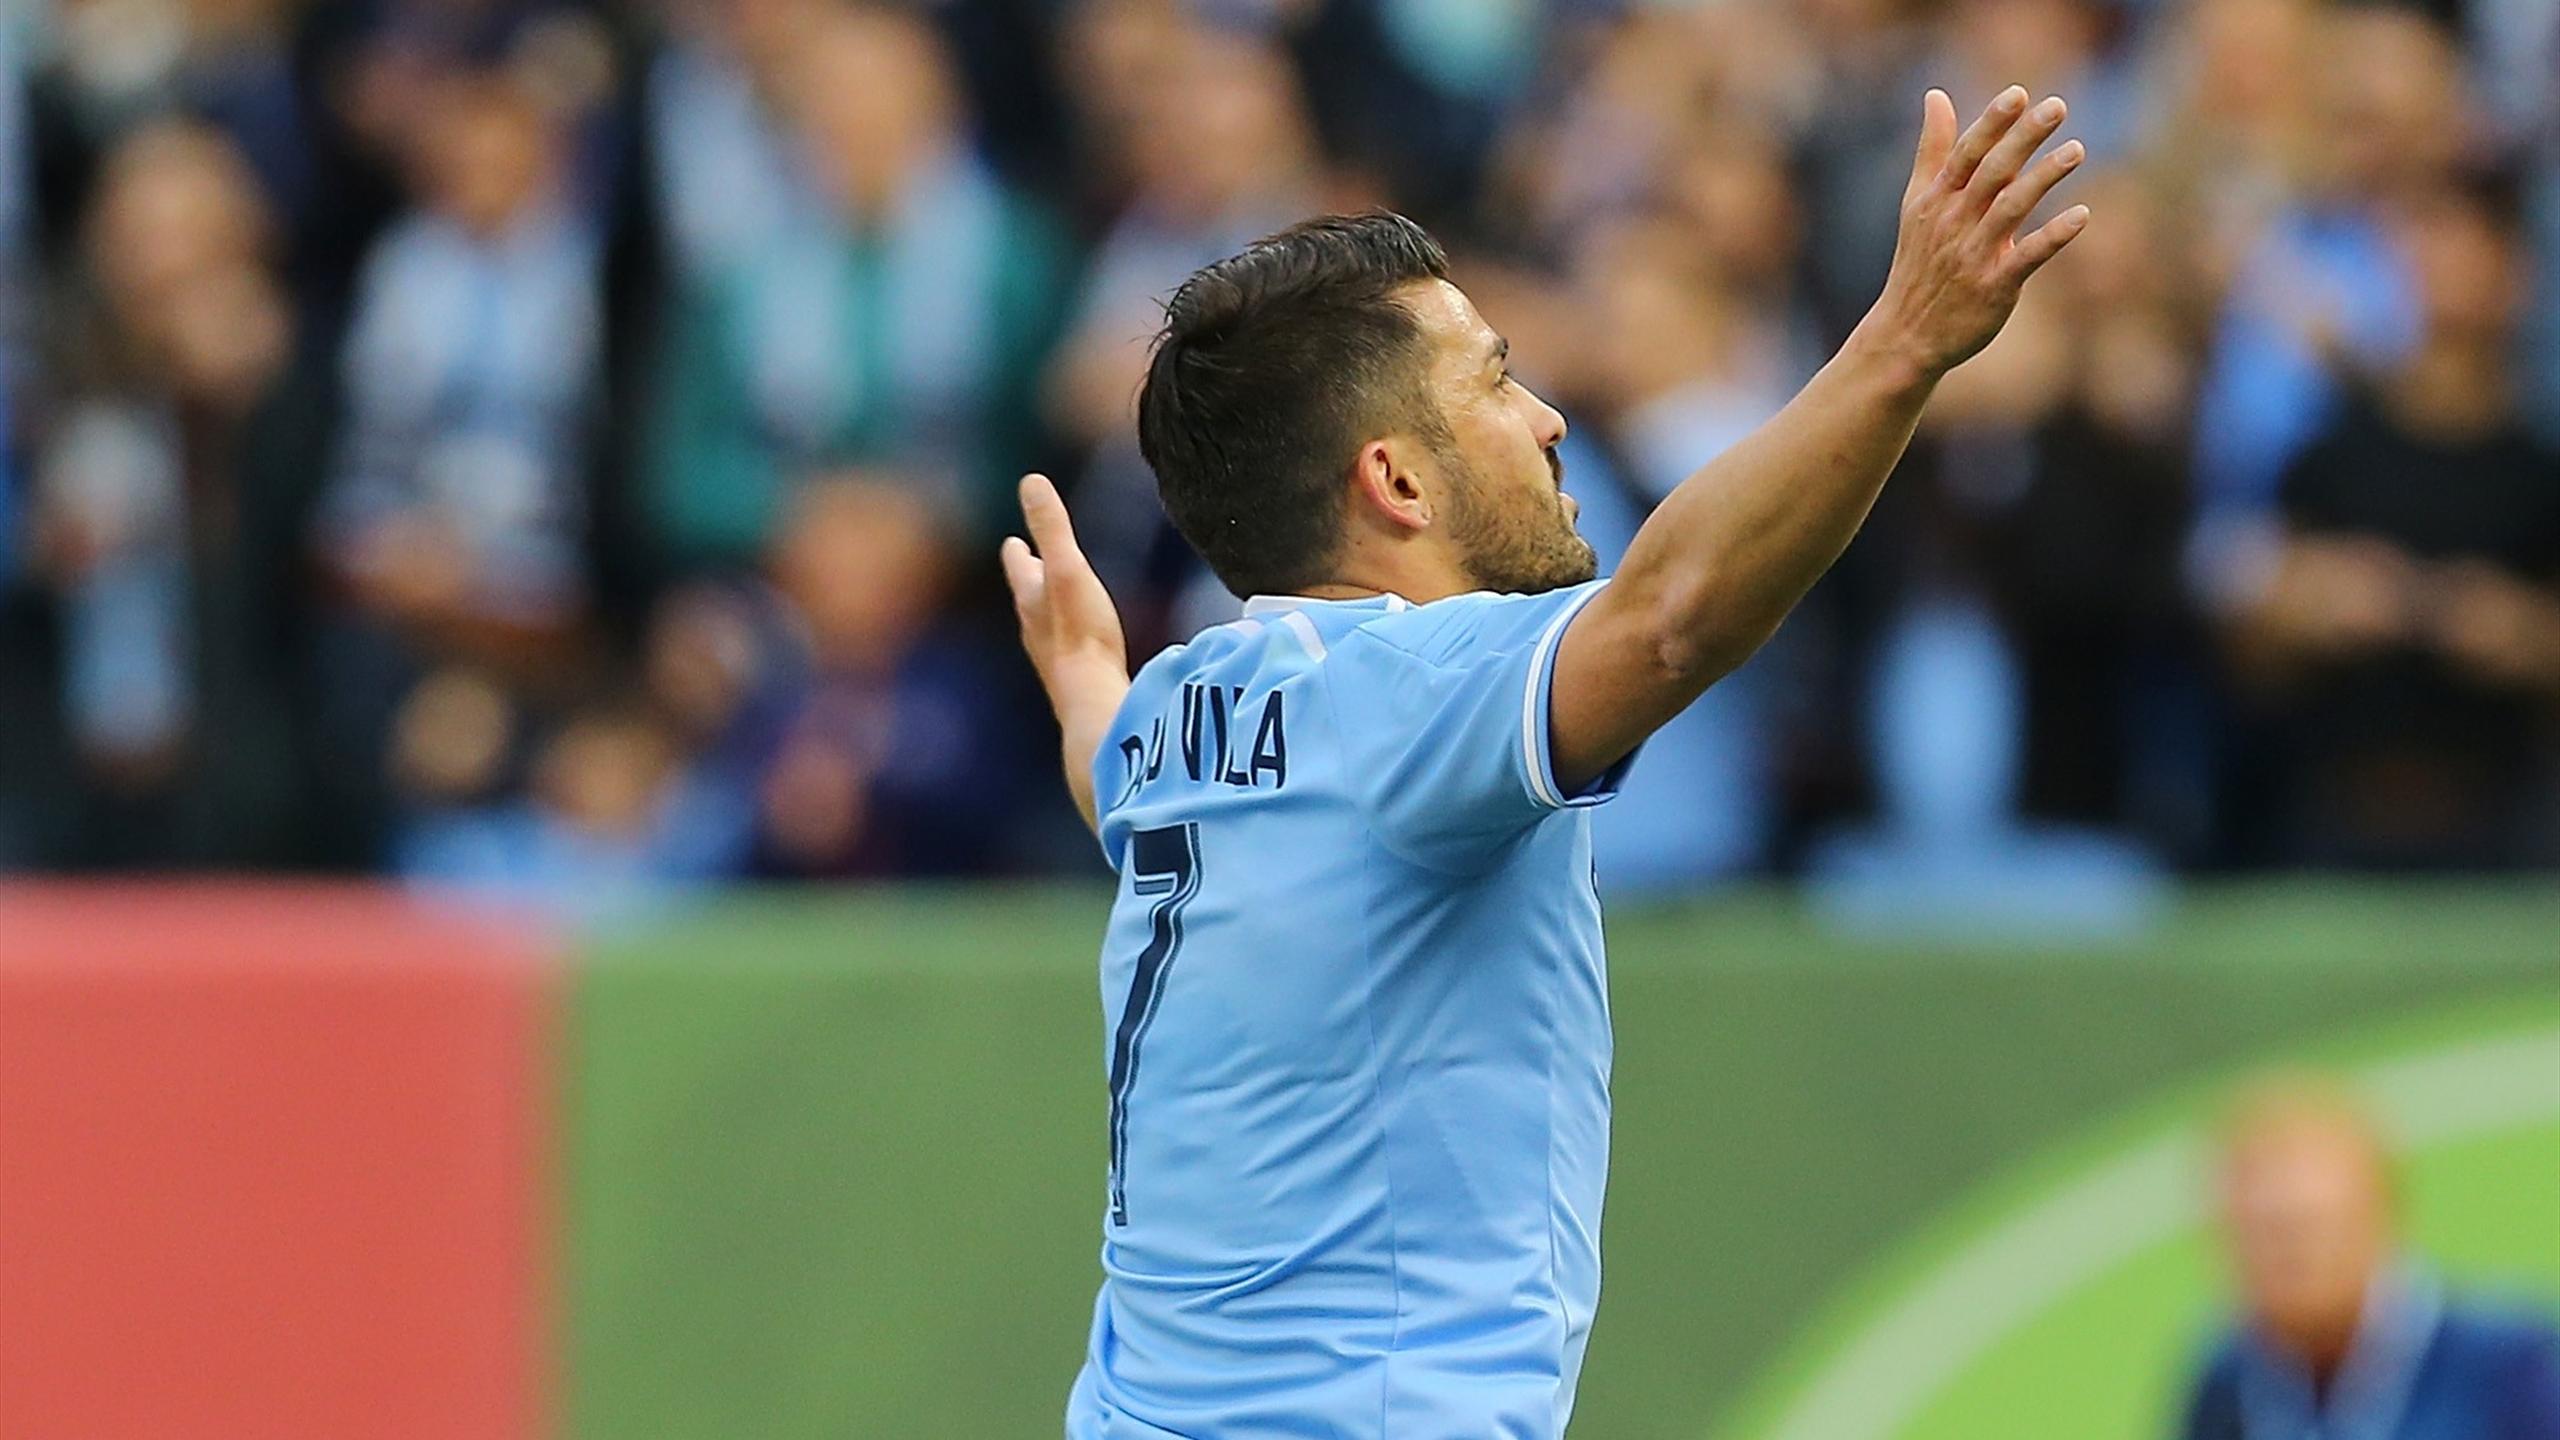 David Villa #7 of New York City FC celebrates his goal